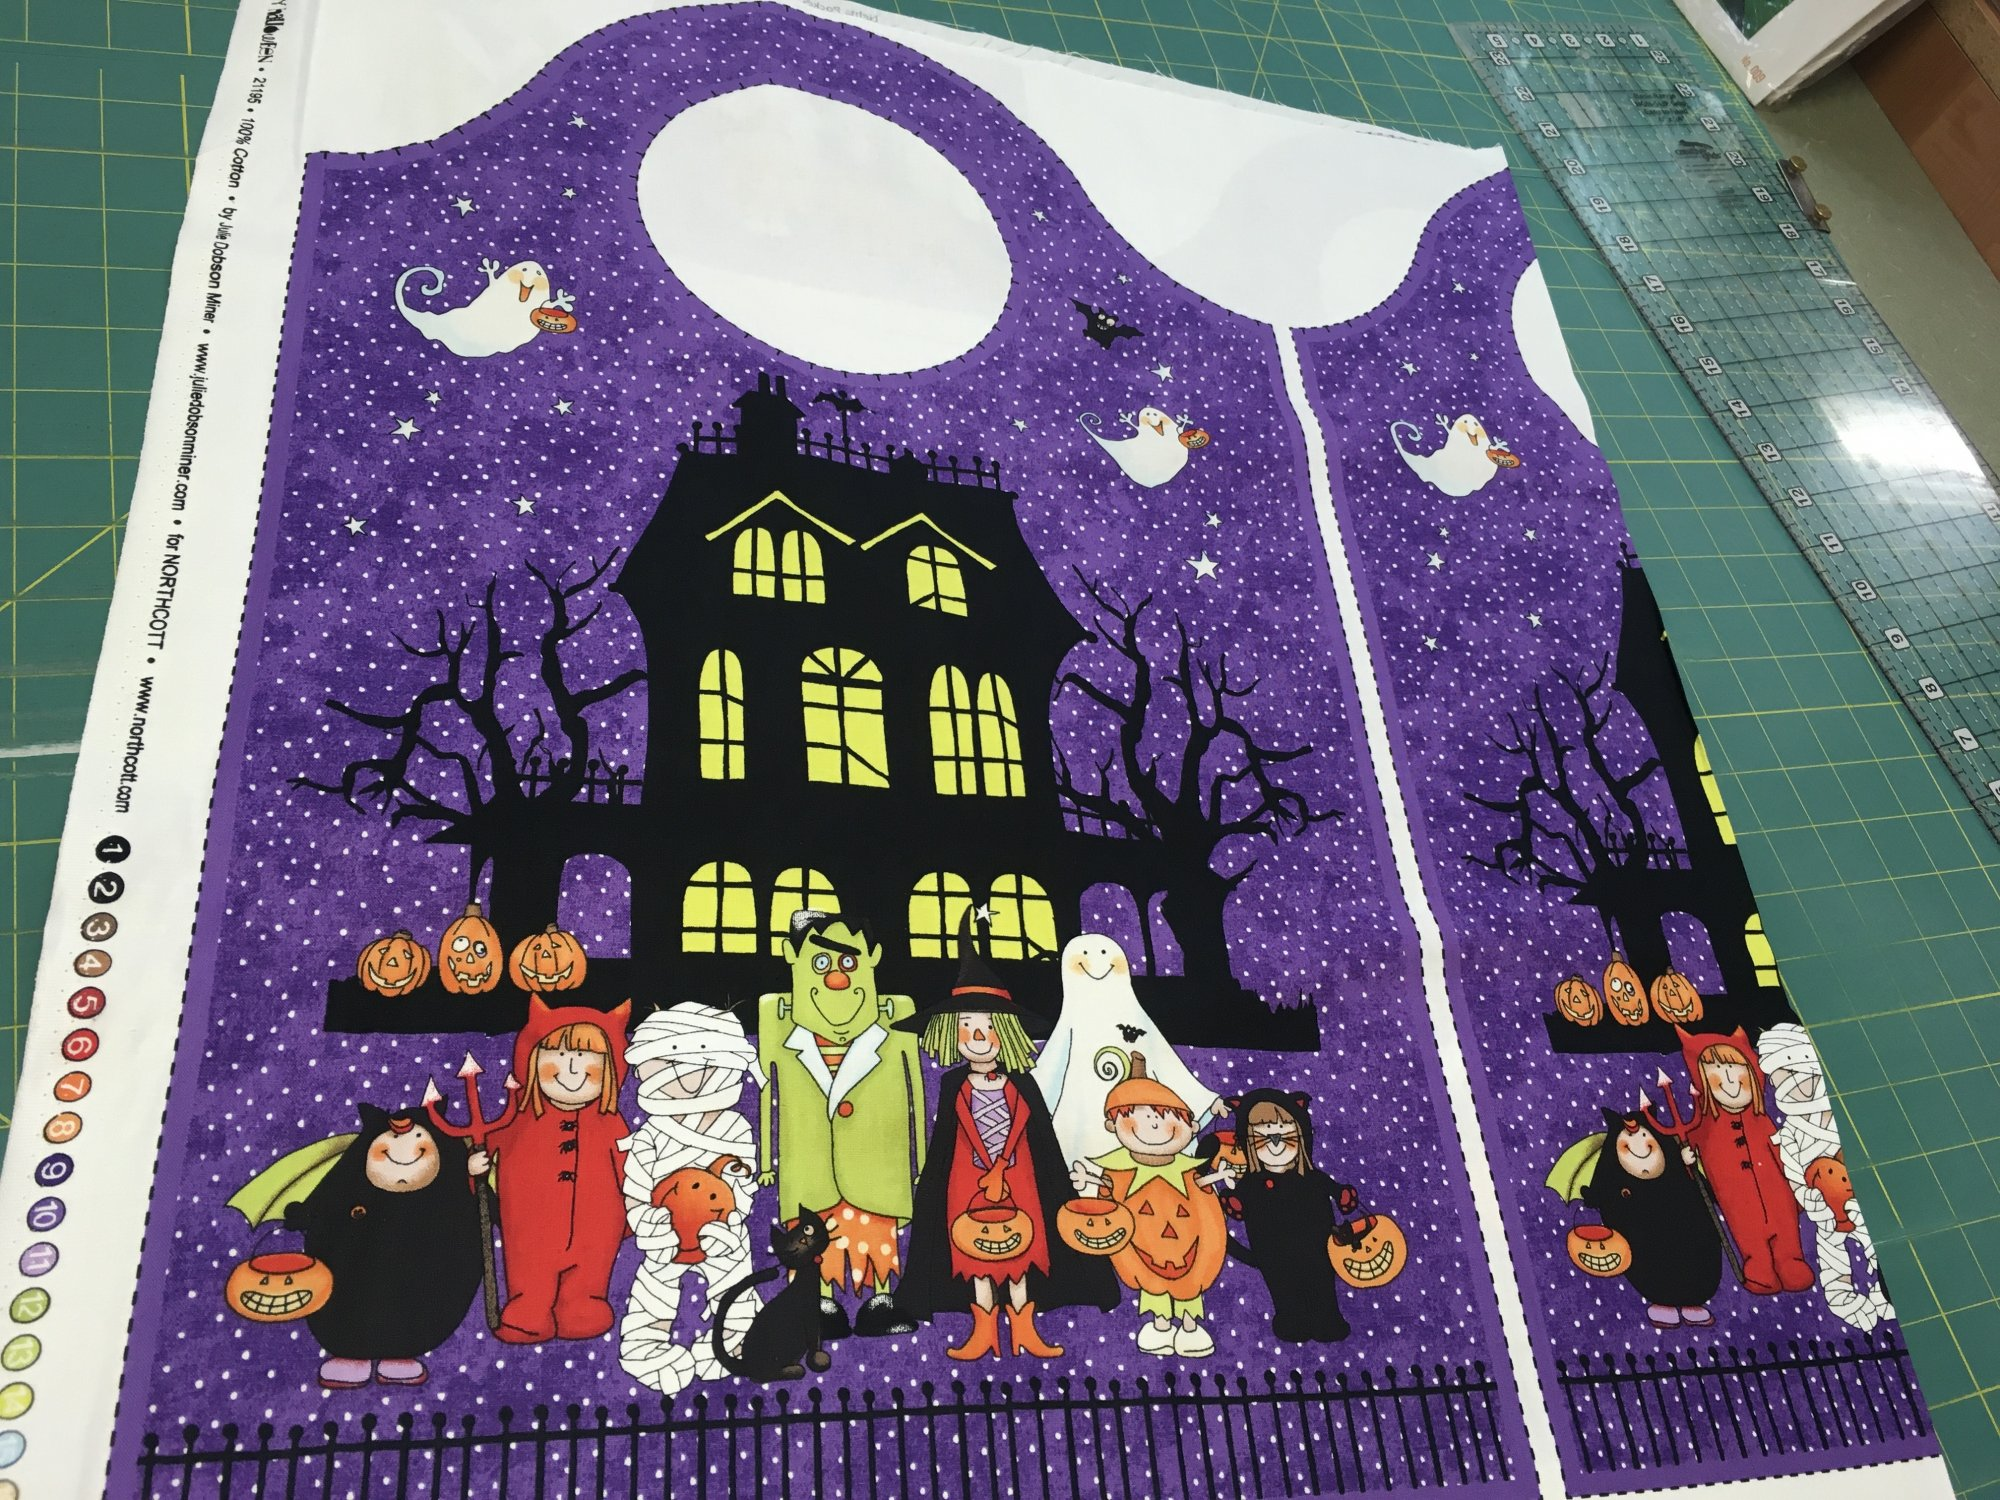 HAPPY HALLOWEEN TREAT BAG PANEL 21195 by Northcott